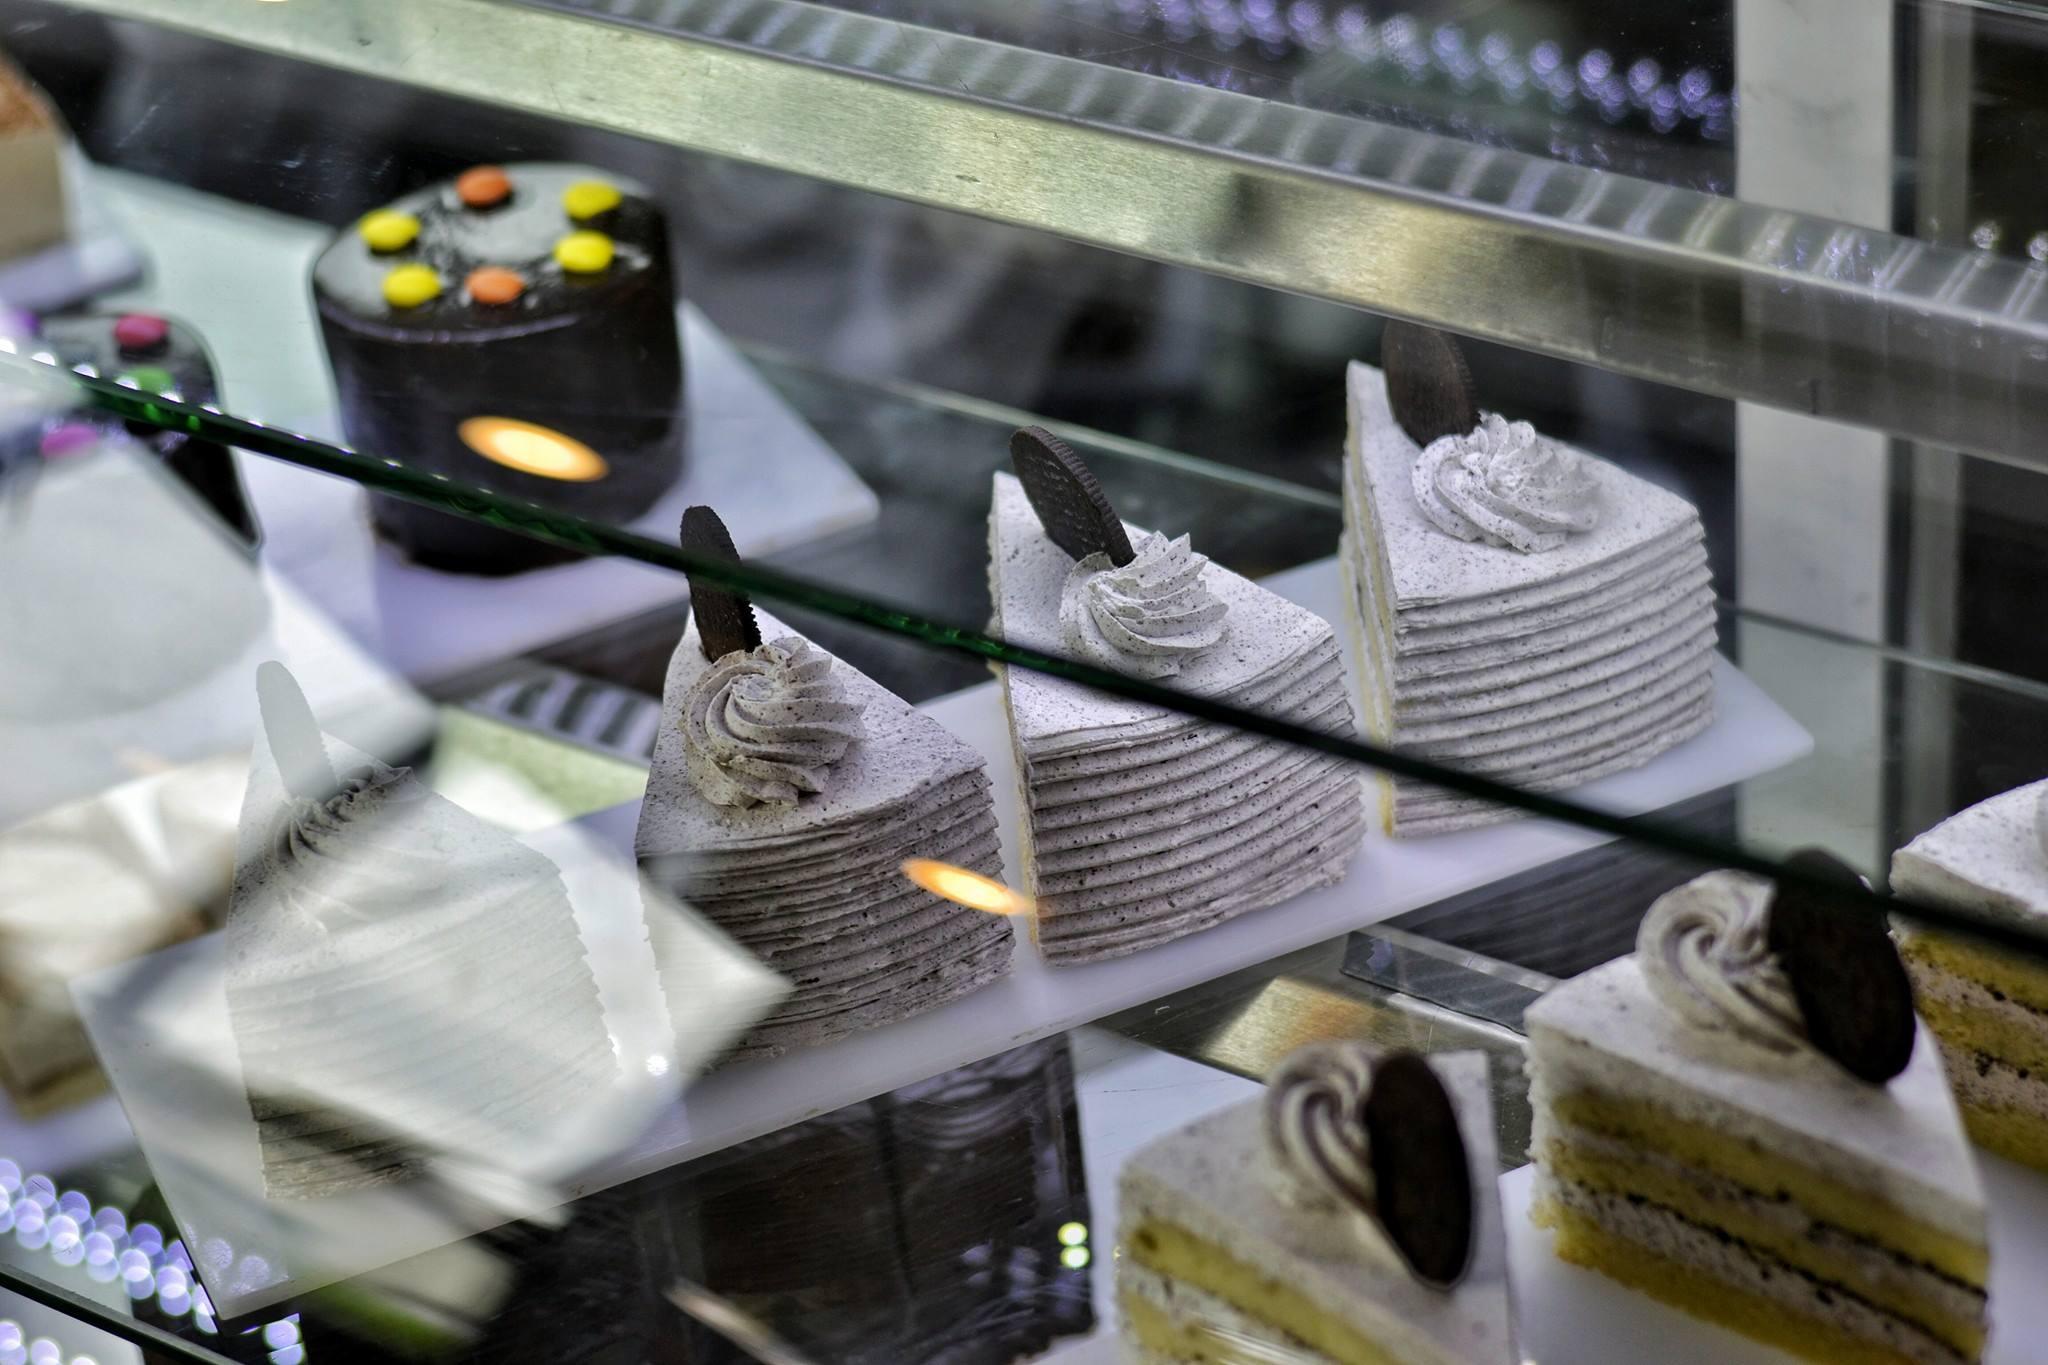 arsenal shop goods